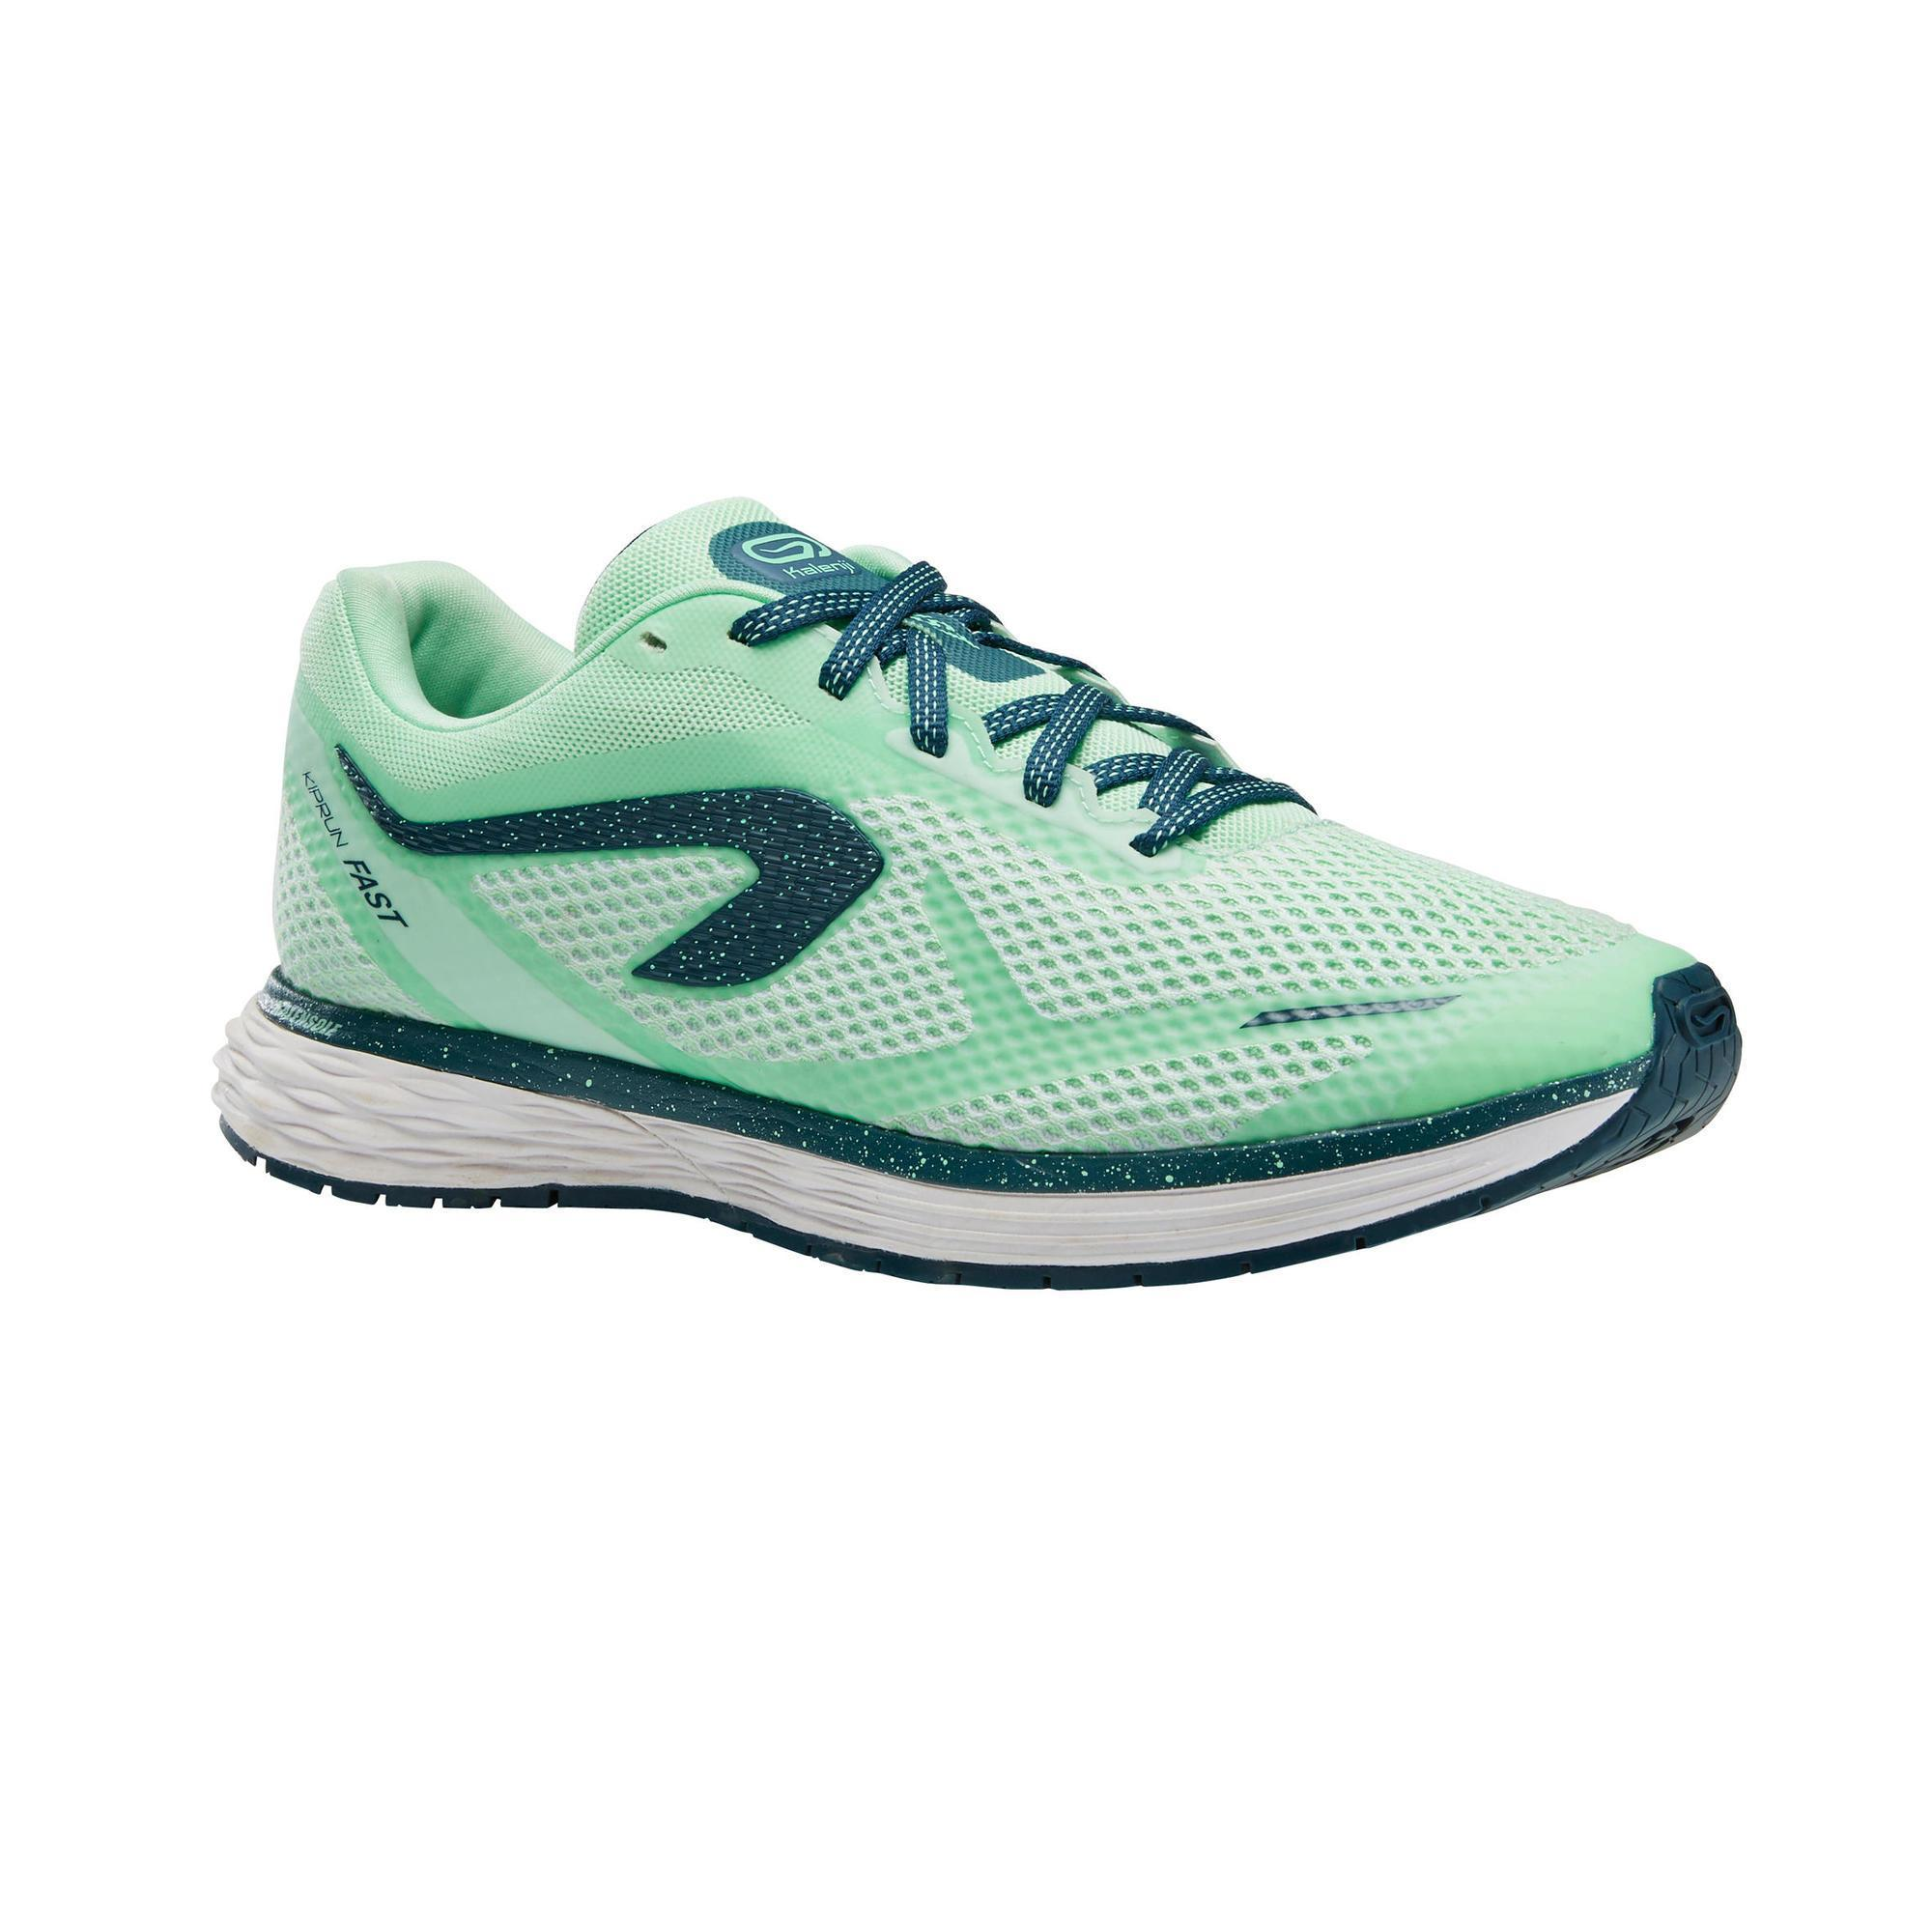 save off 65944 7d6d8 Comprar Zapatillas de running para correr mujer   Decathlon